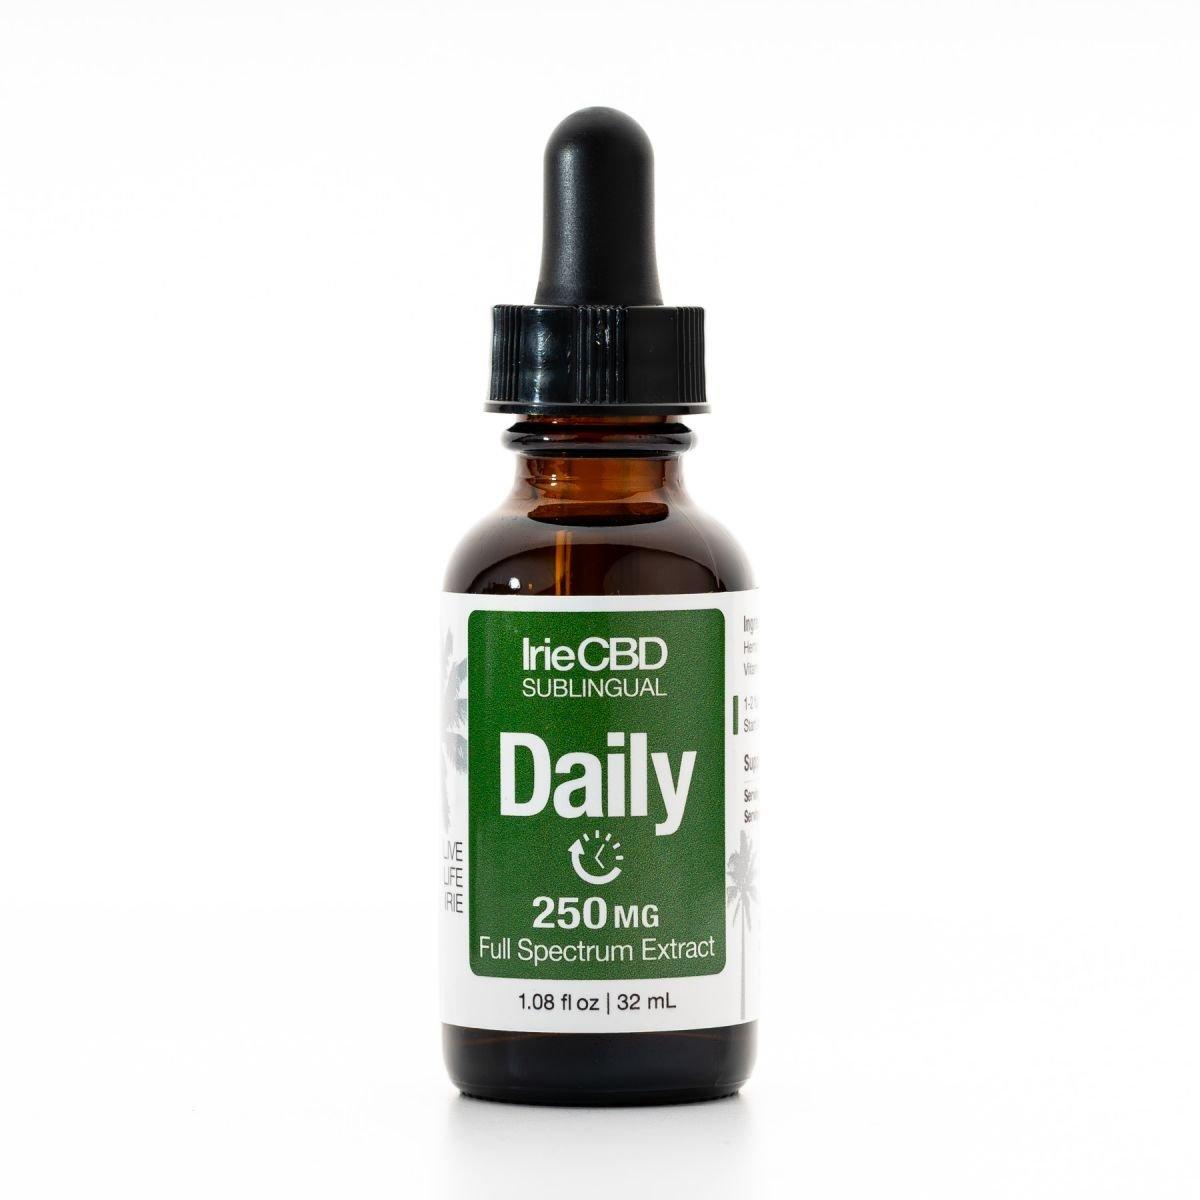 IrieCBD Daily CBD Oil Tincture